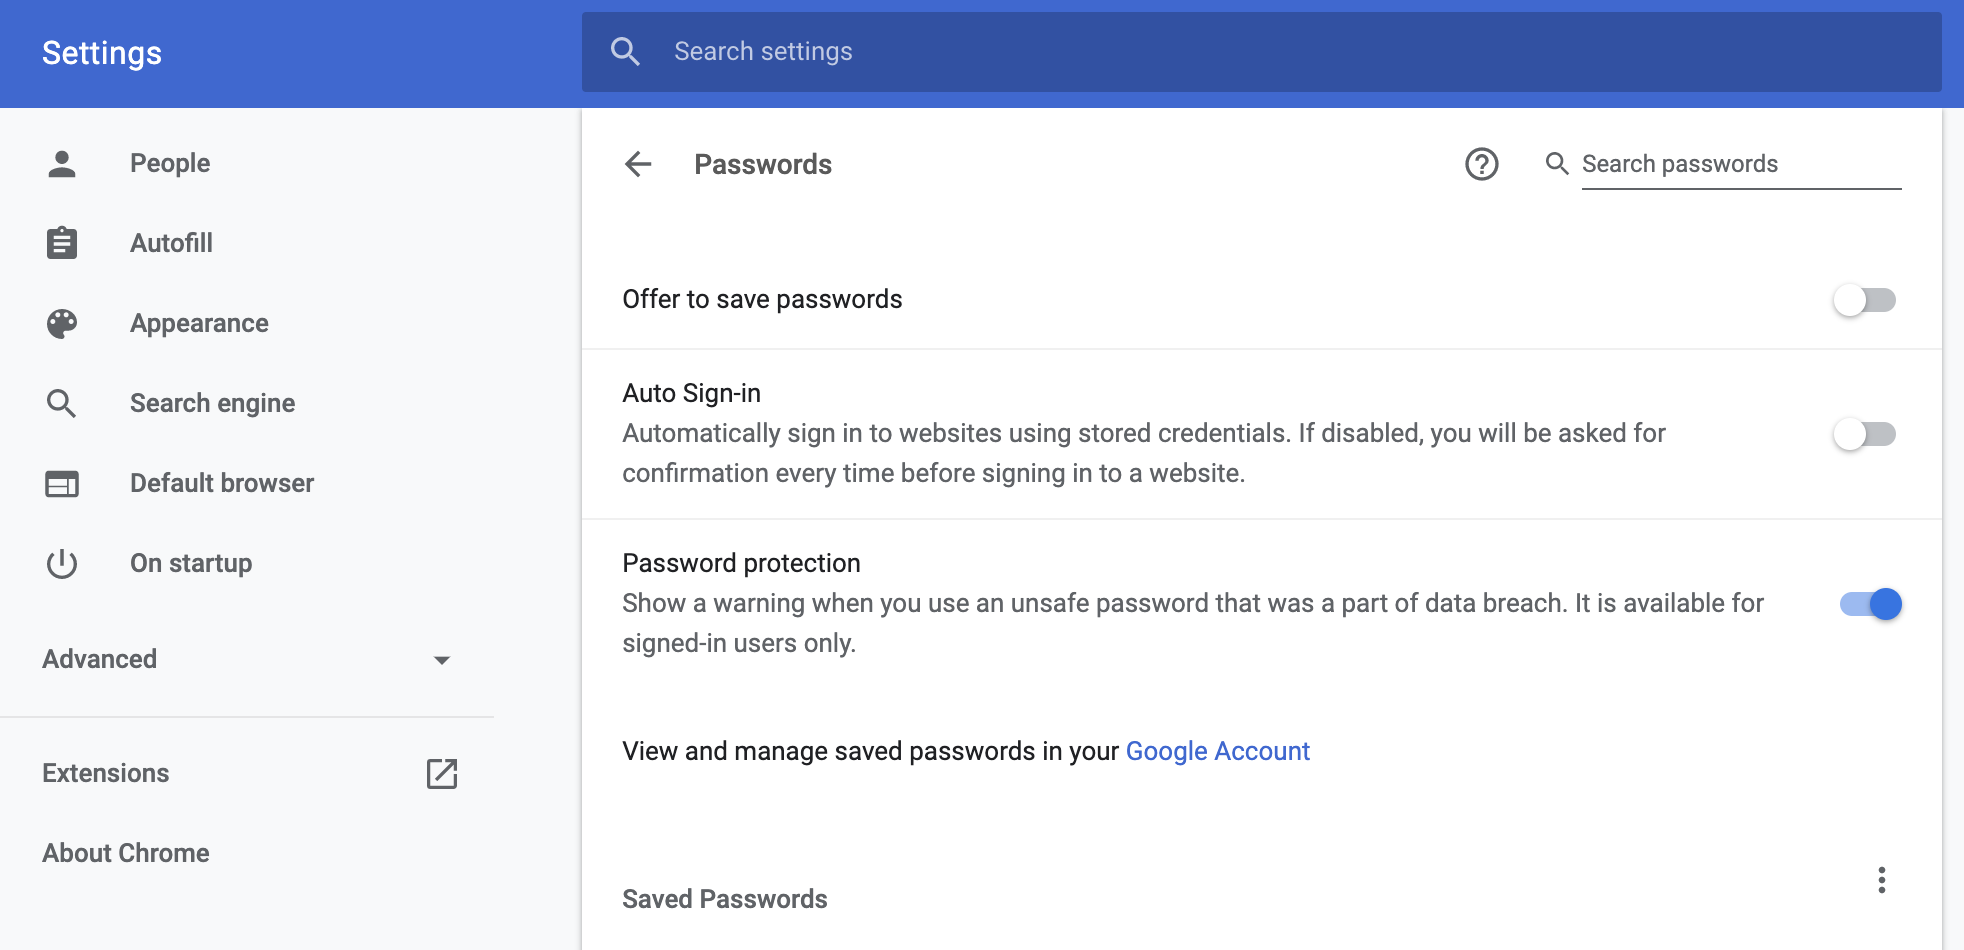 Google Chrome is preparing native password leak detection